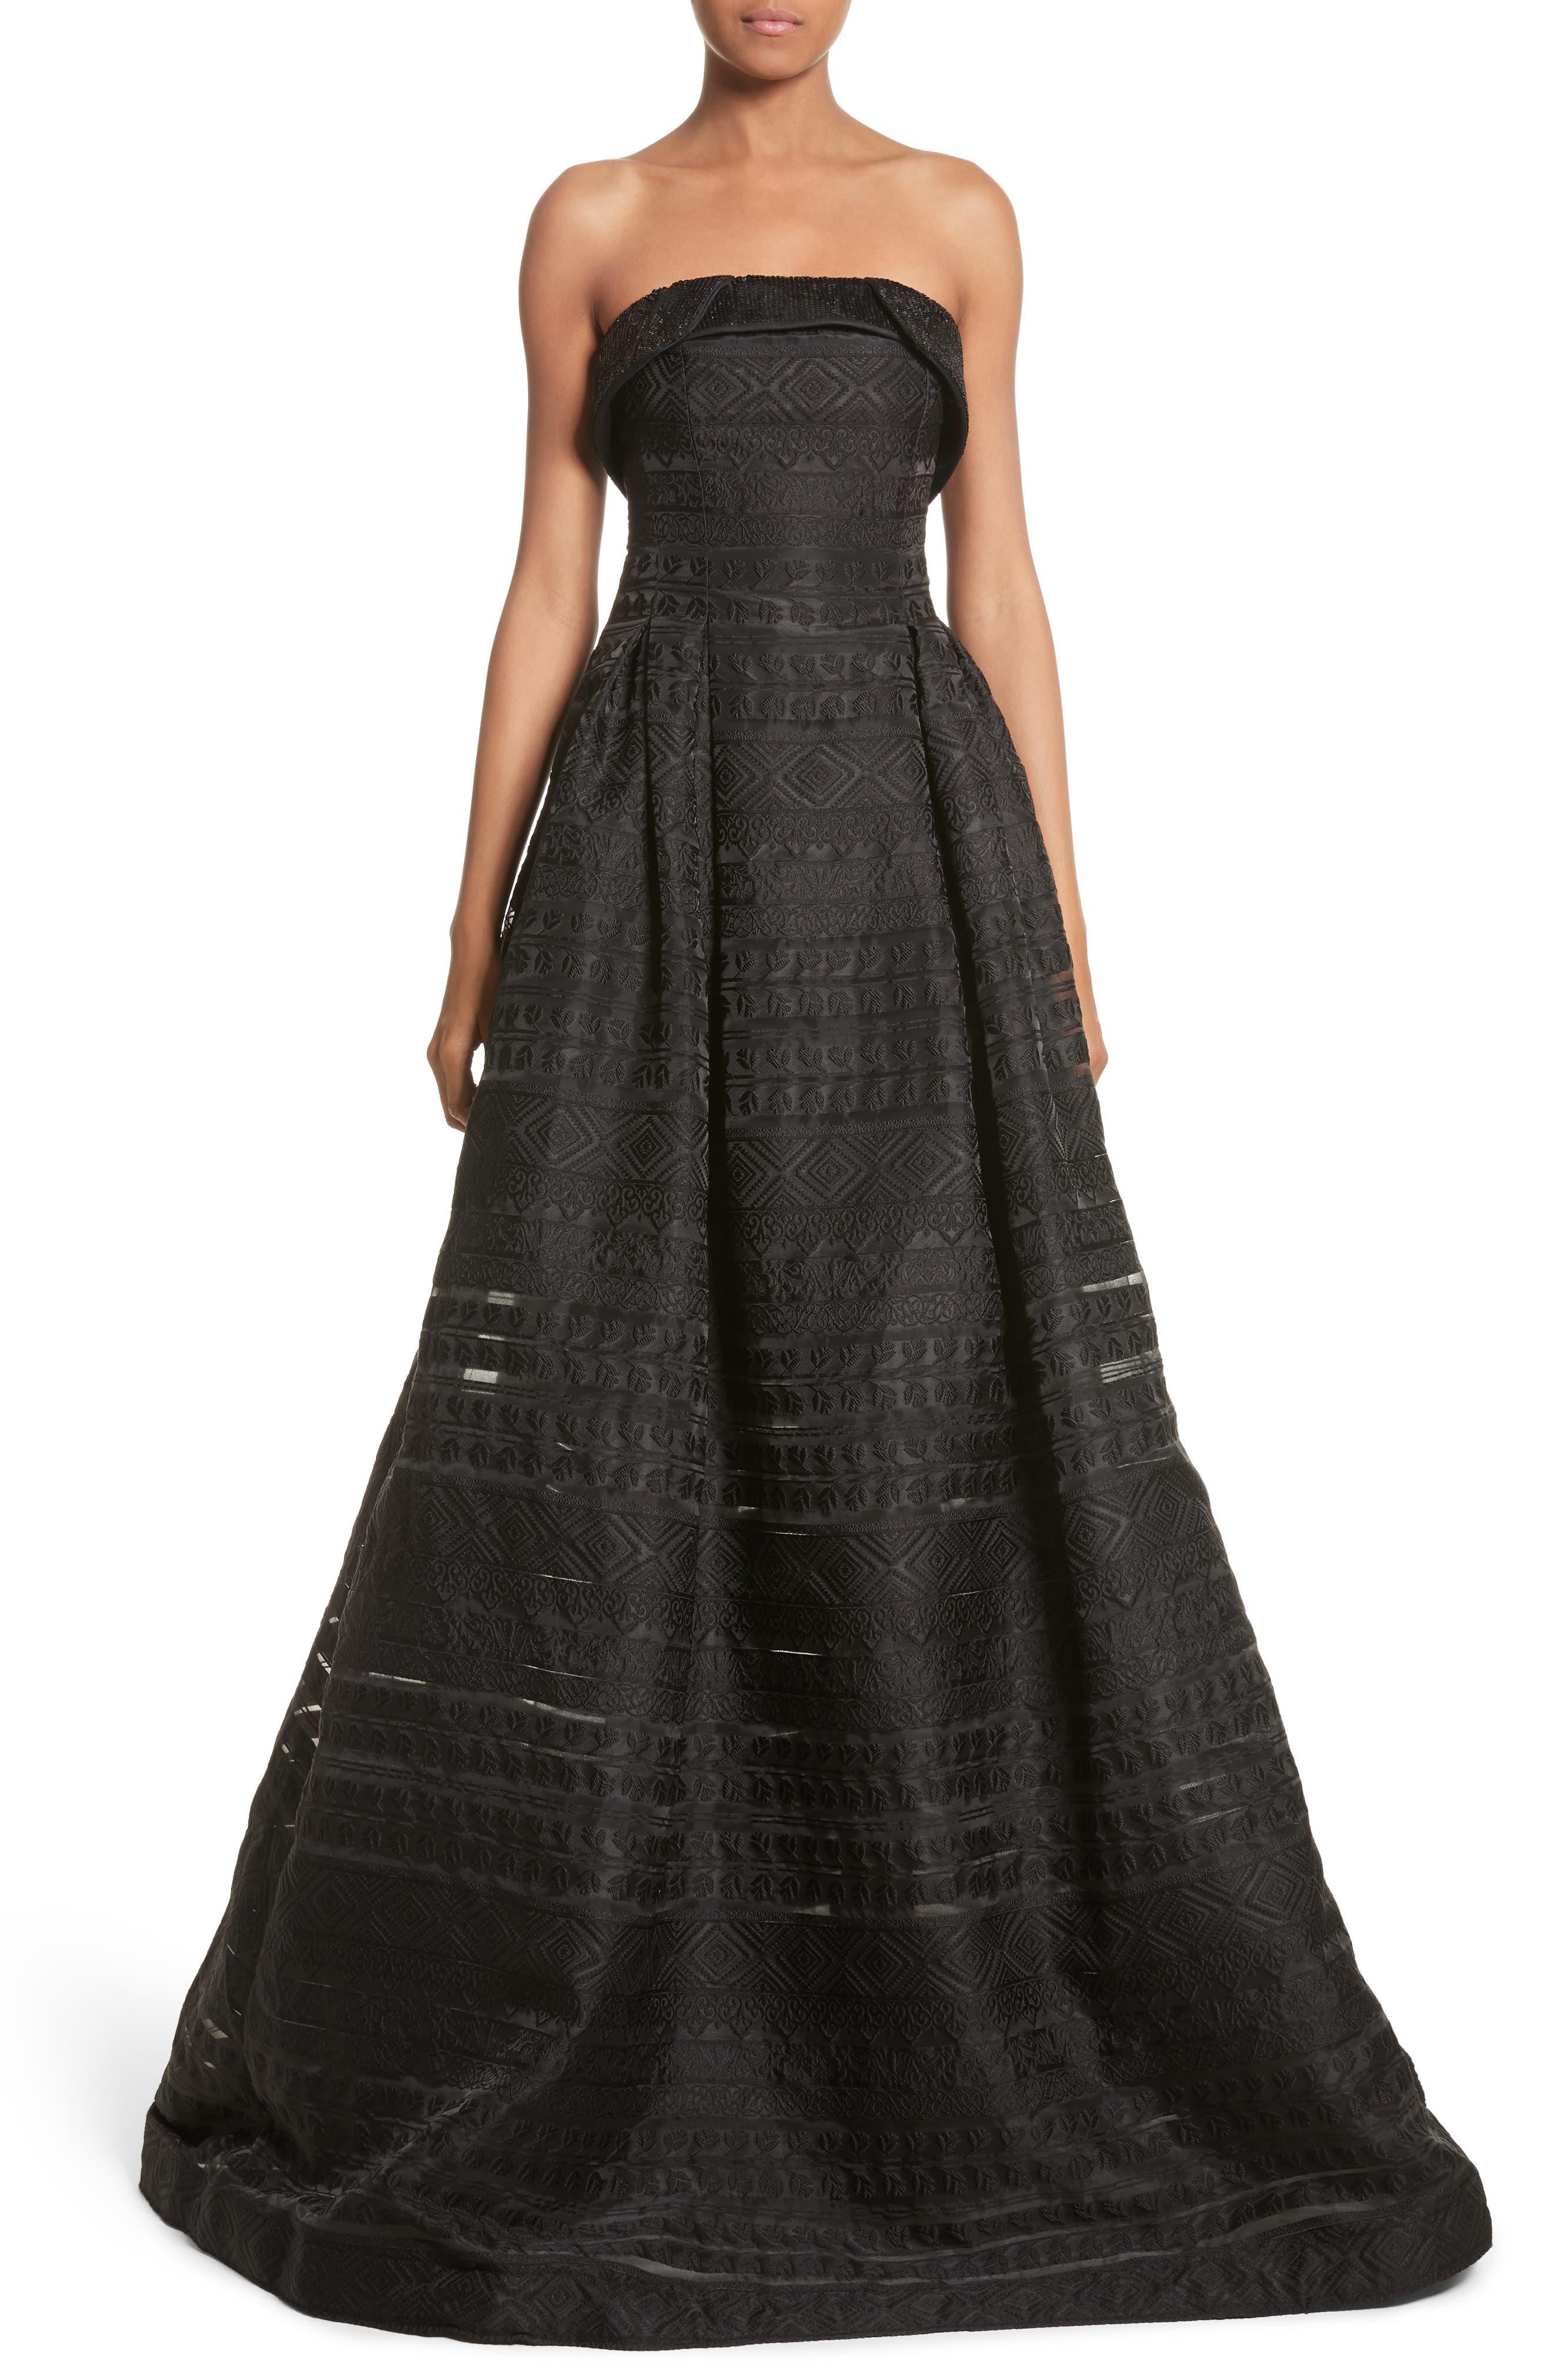 Sachin & Babi Noir Istiklal Embellished Strapless Ballgown